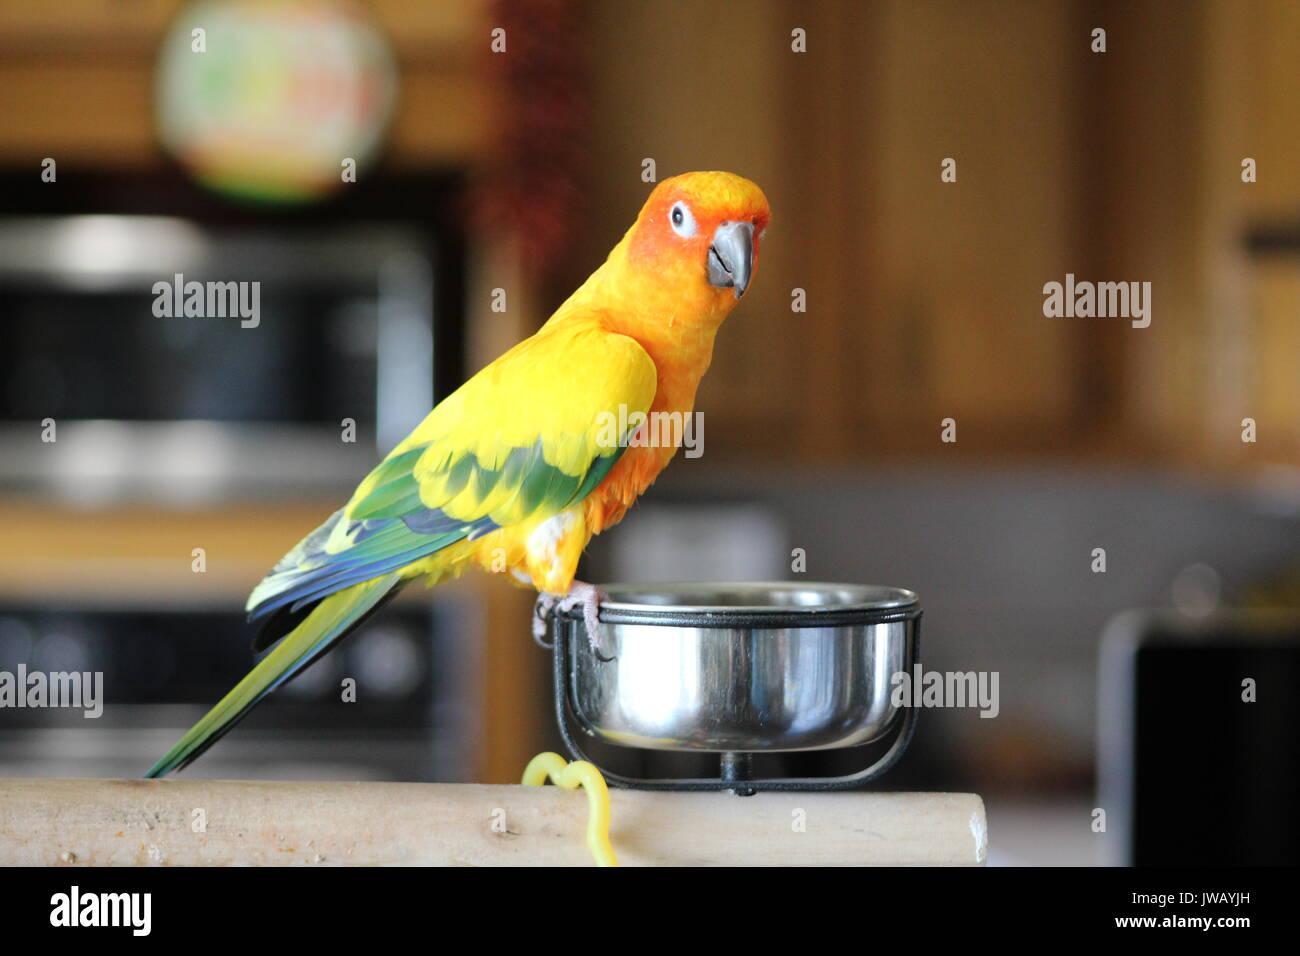 olivgrüner papagei